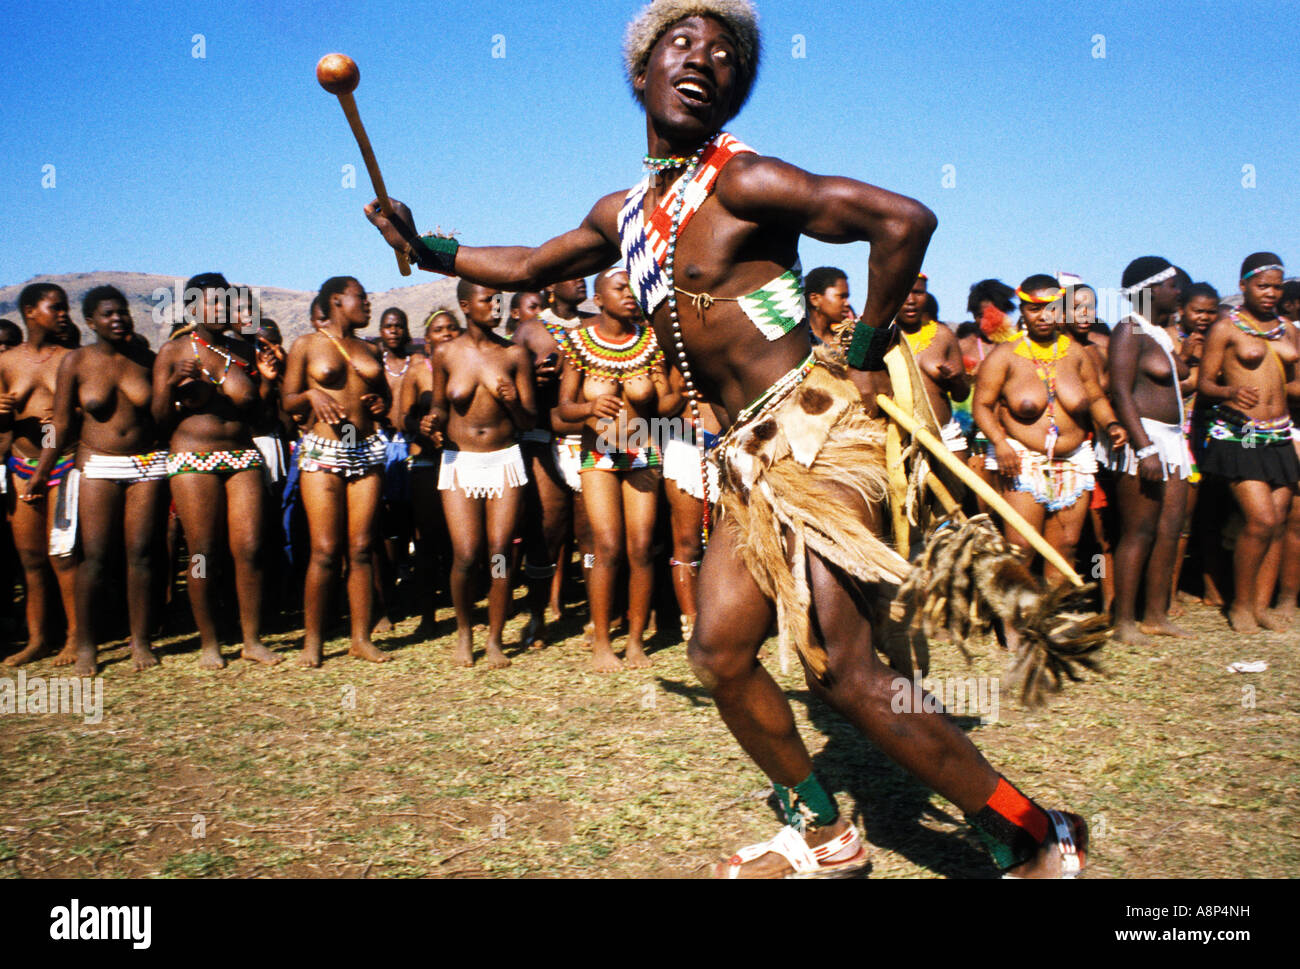 Zulu reed dance stock photos zulu reed dance stock images alamy zulu reed dance ceremonial participants natal south africa stock image stopboris Choice Image